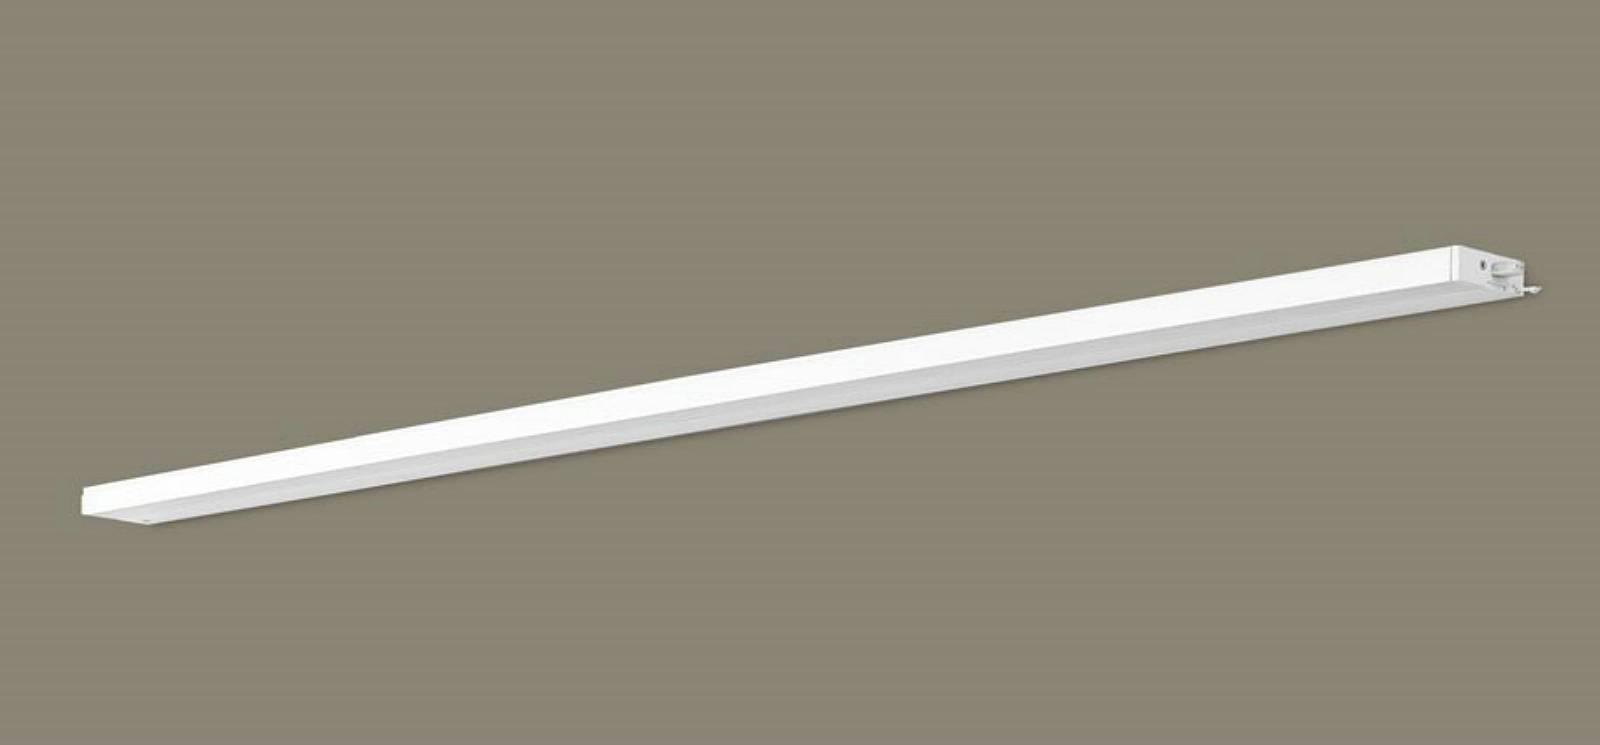 T区分 パナソニック LGB51375XG1 ベースライト 建築化照明器具 単独使用不可 畳数設定無し LED【setsuden_led】